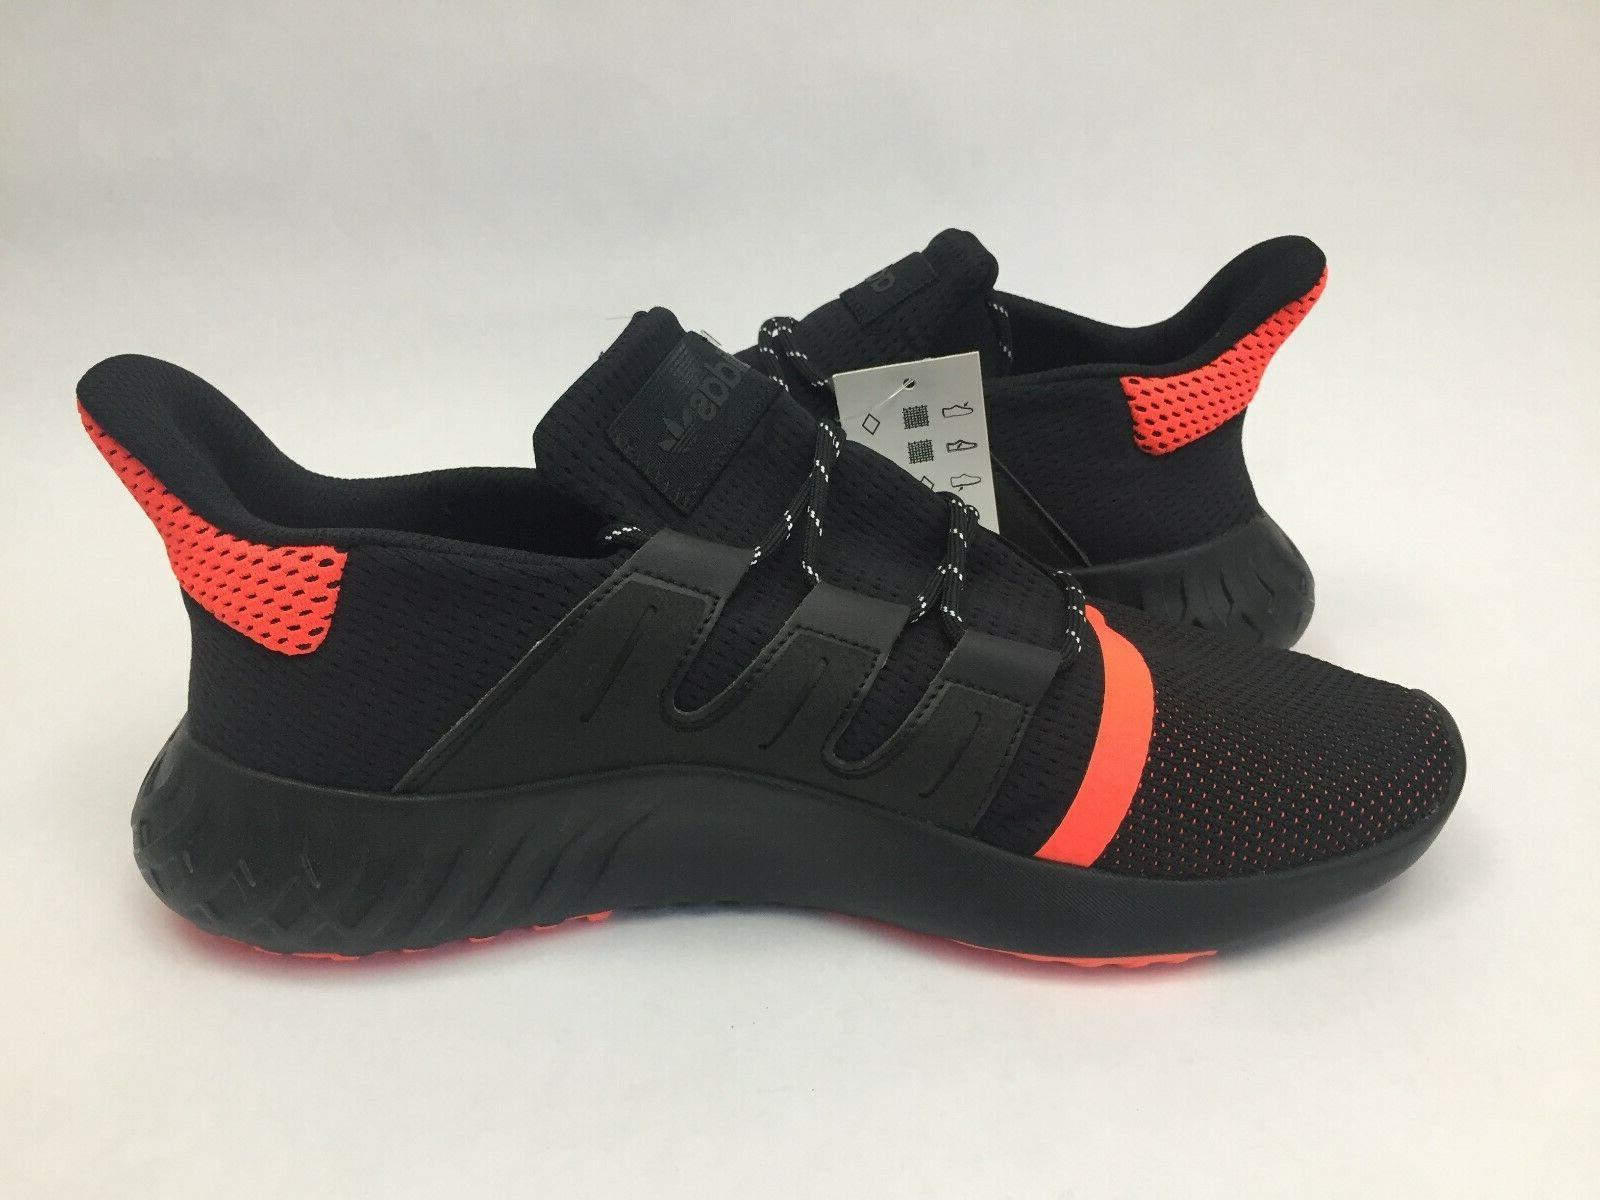 New Adidas AQ1189